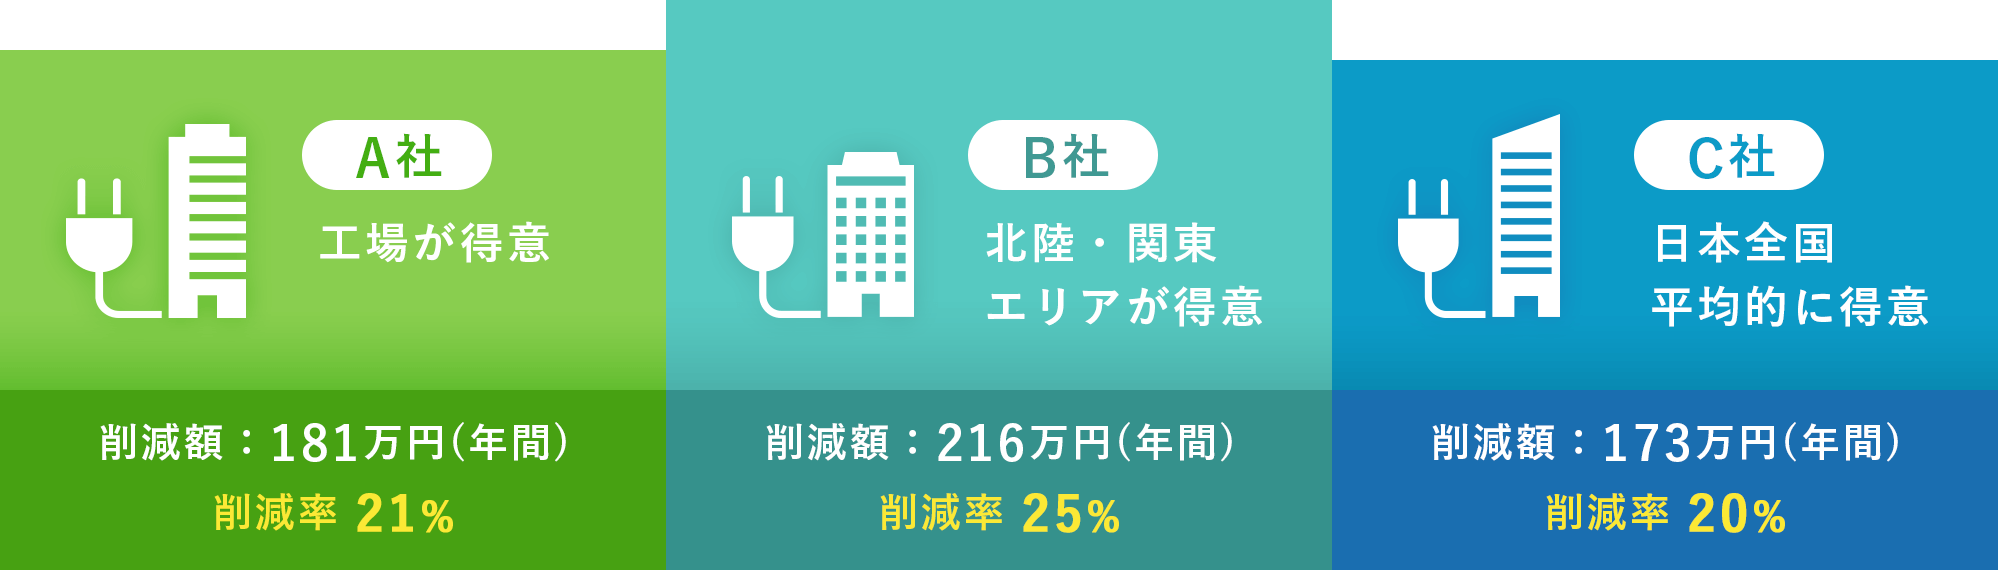 A社工場が得意 B社北陸・関東エリアが得意 C社日本全国平均的に得意